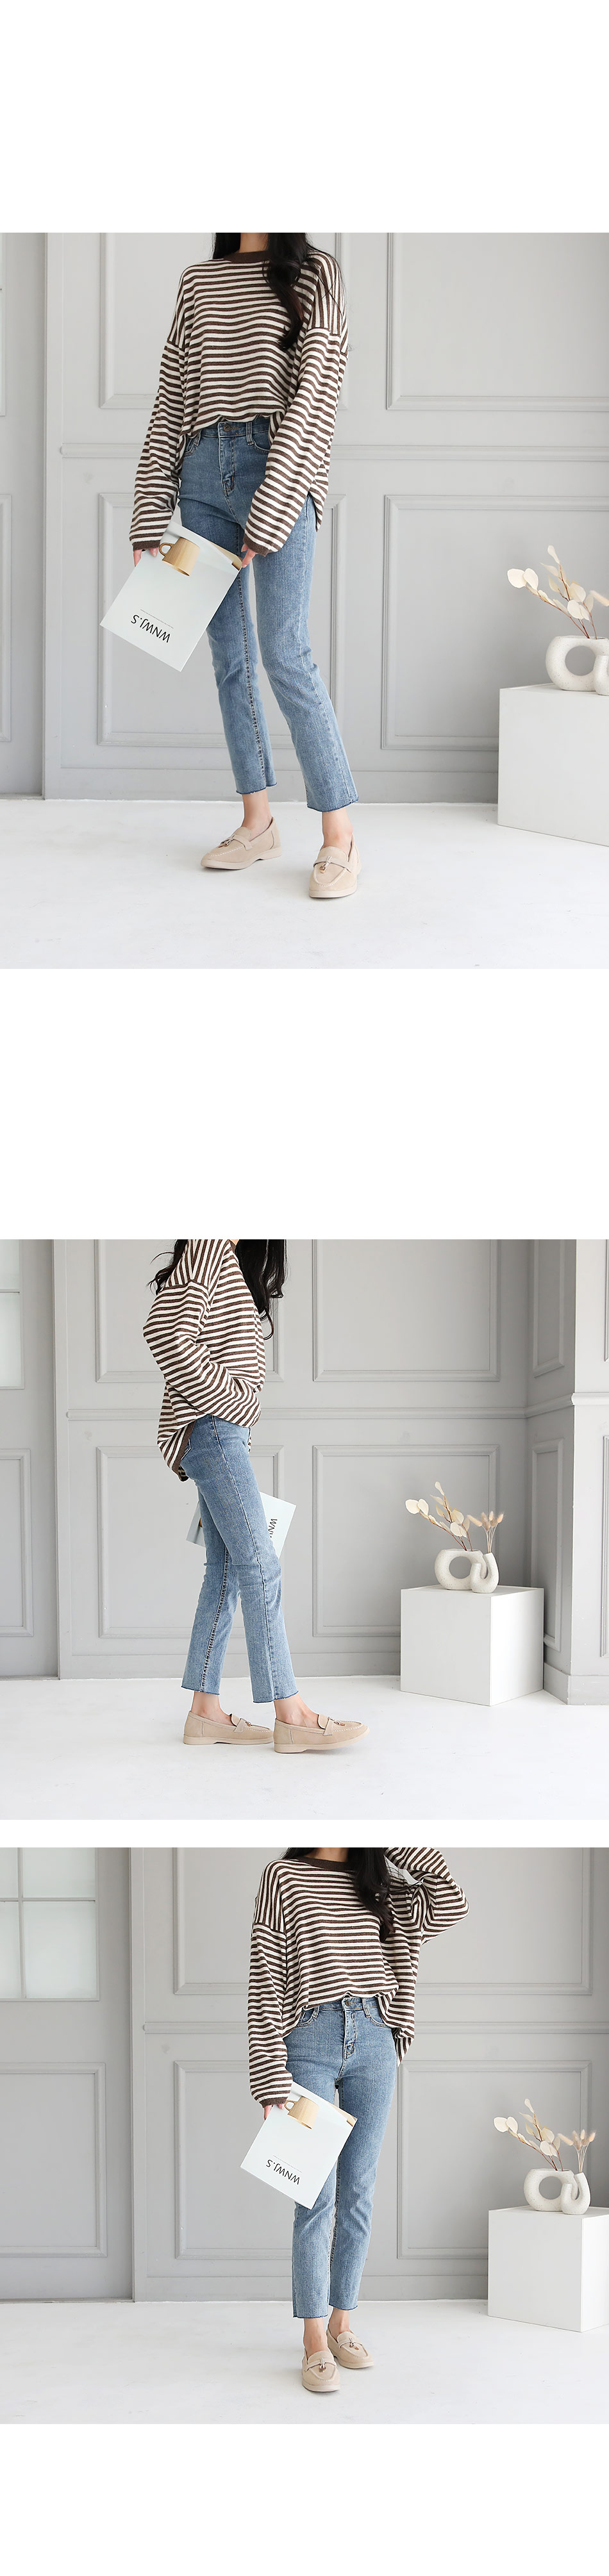 Chloe cashmere Tangara knit